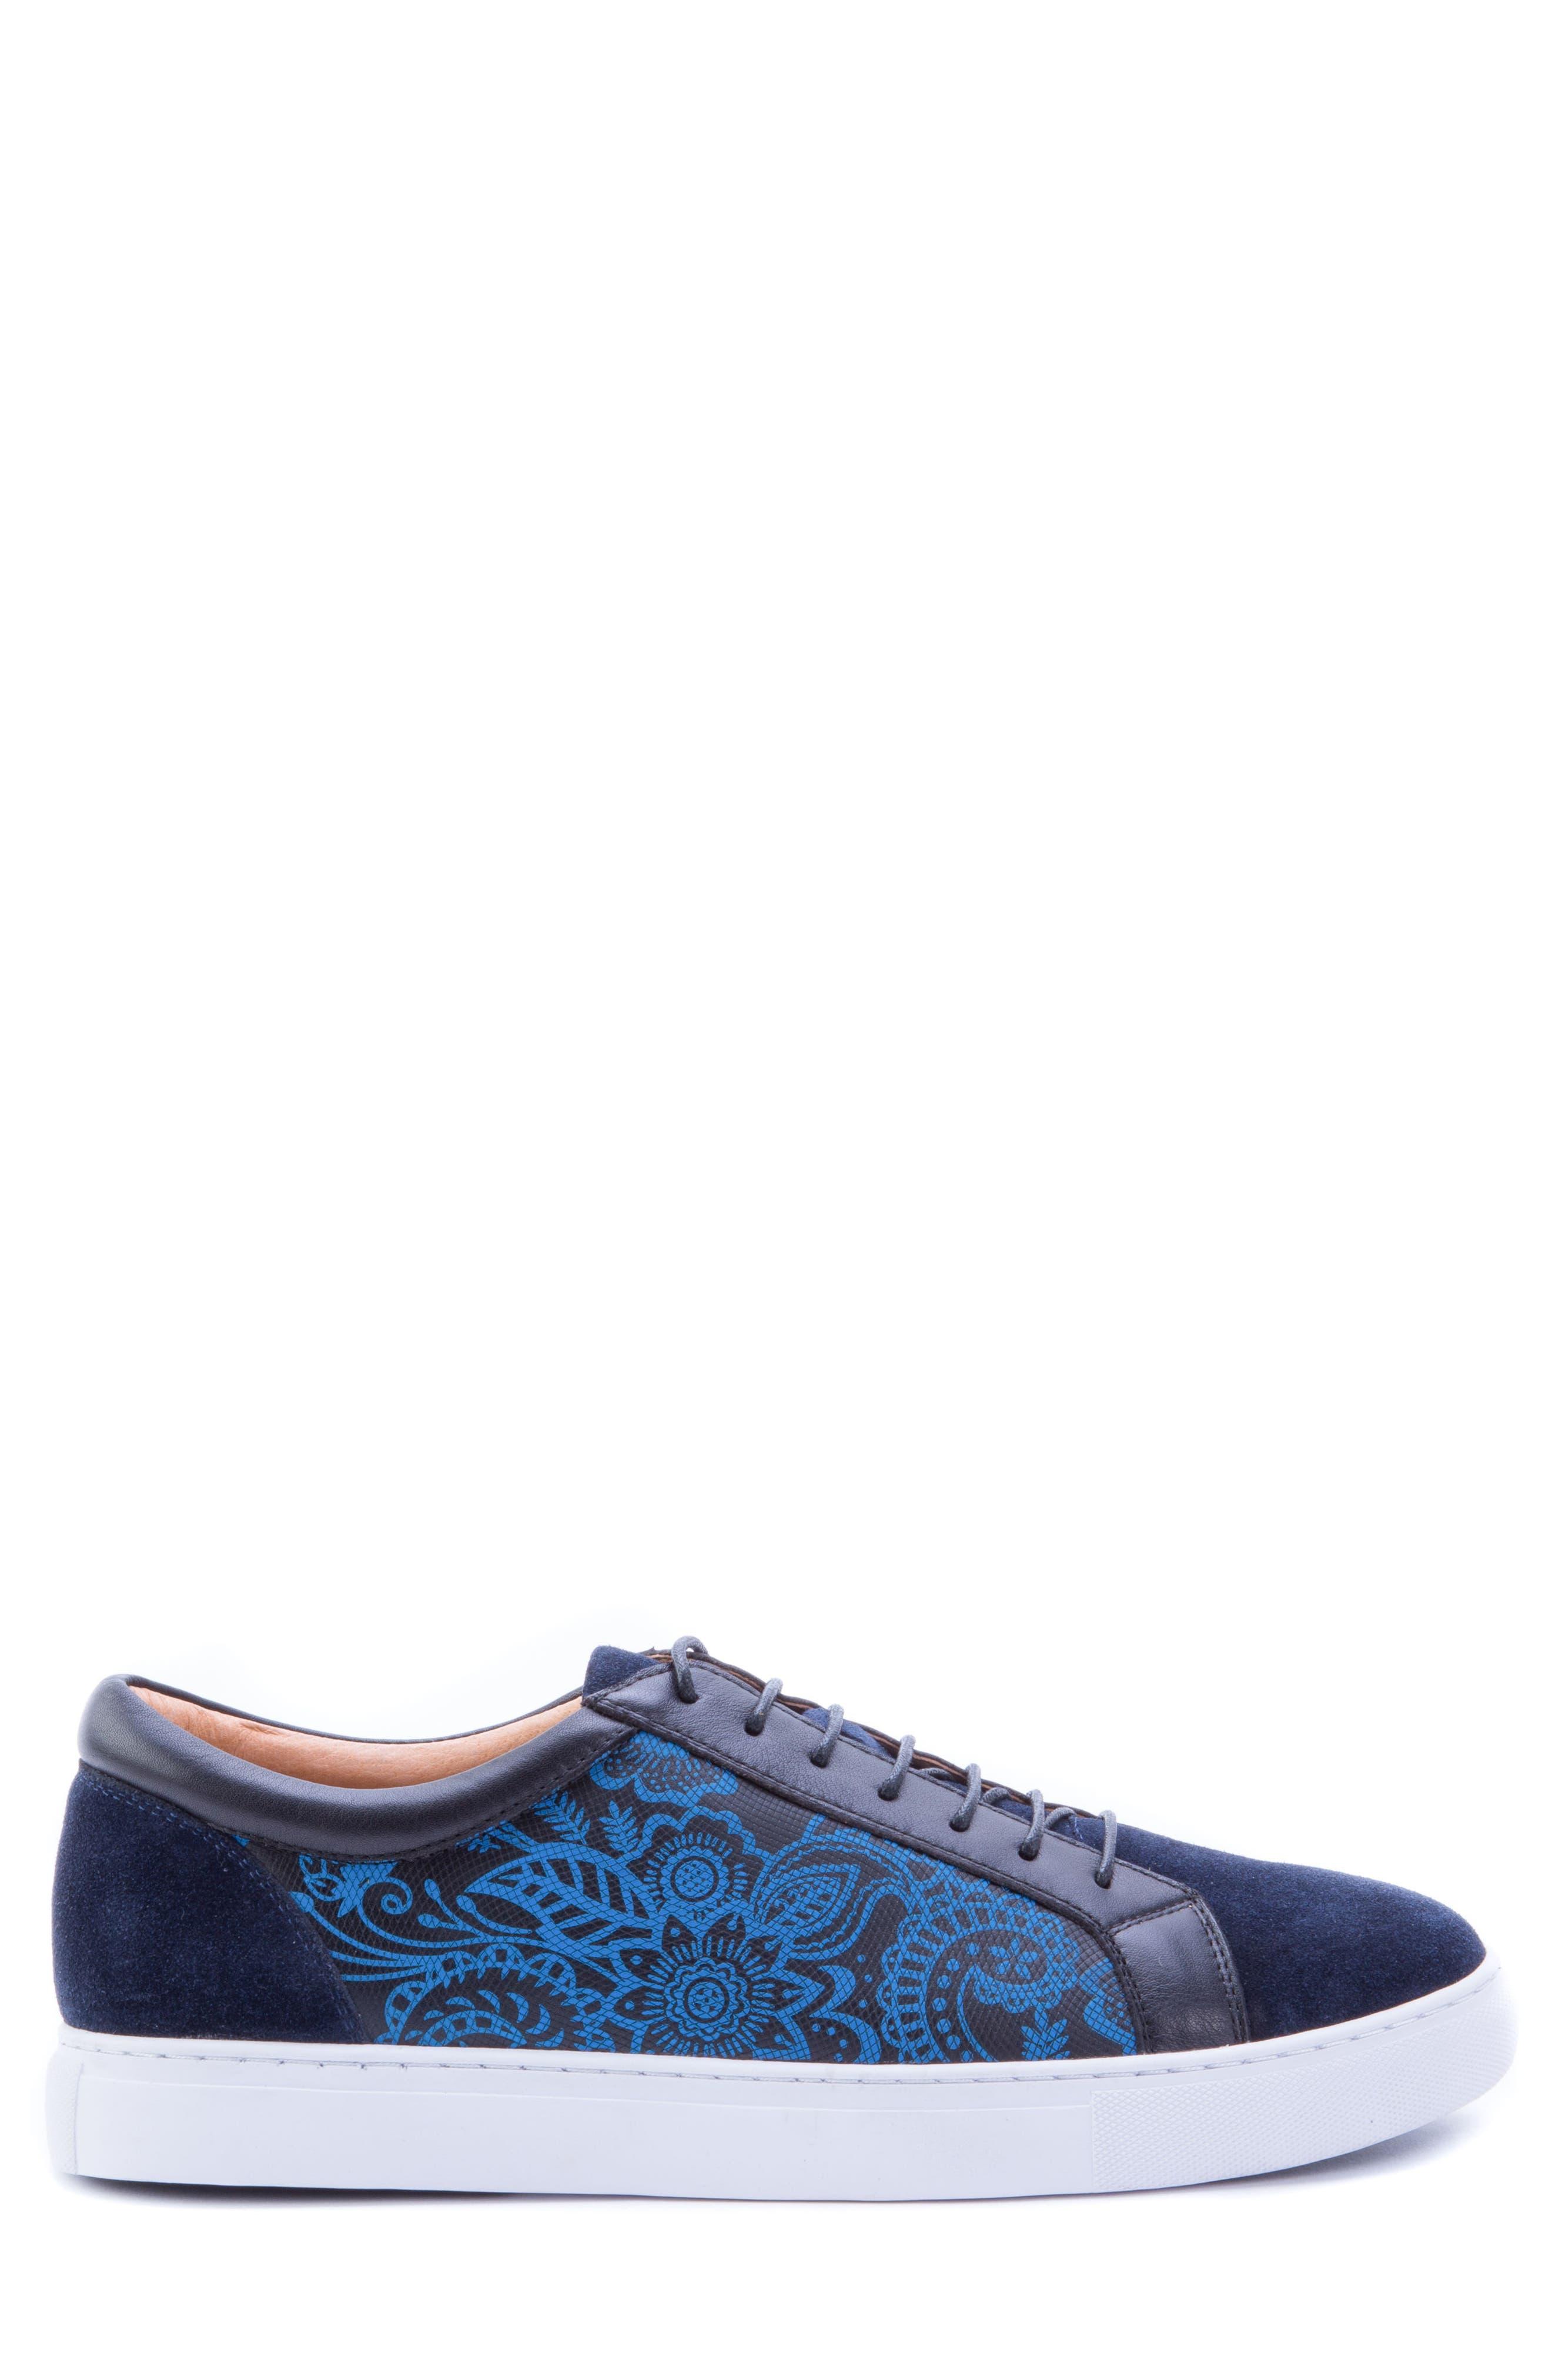 Rubio Floral Sneaker,                             Alternate thumbnail 3, color,                             Navy Suede